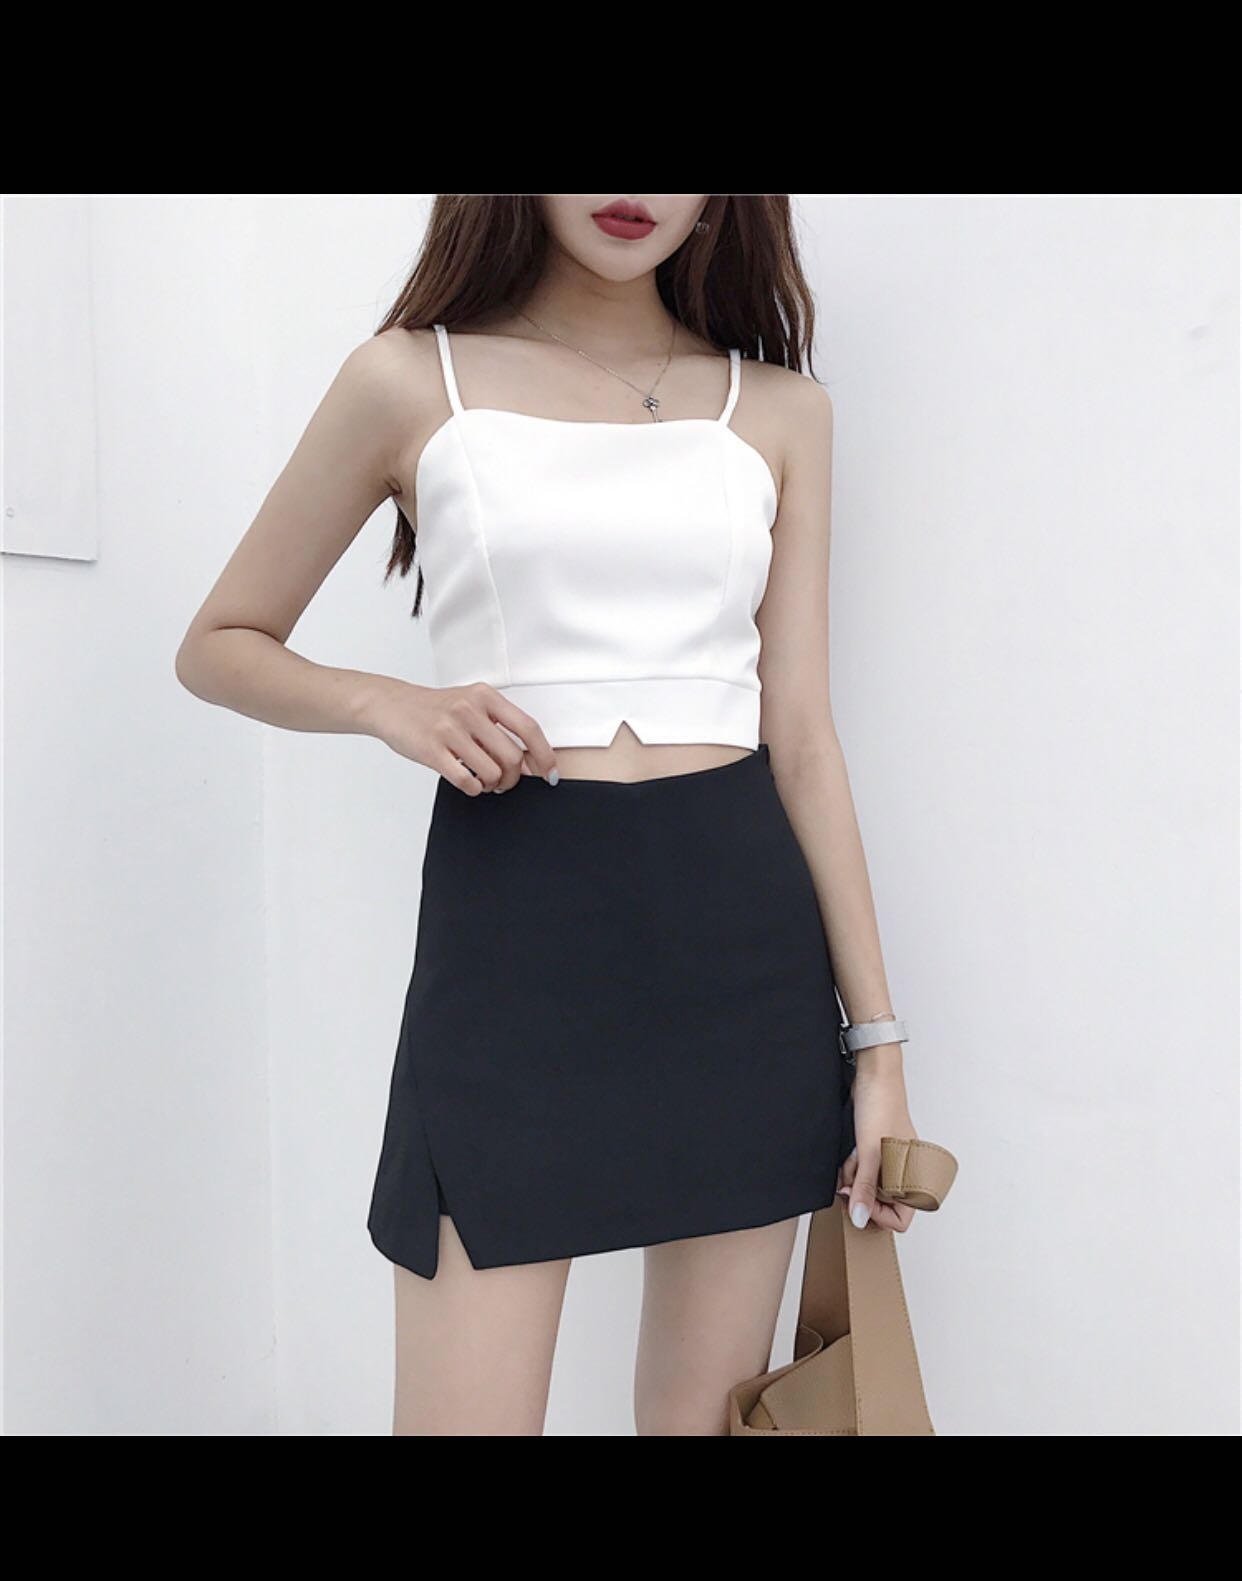 ddd82455d INSTOCK] korean style black skirt, Women's Fashion, Clothes, Dresses ...